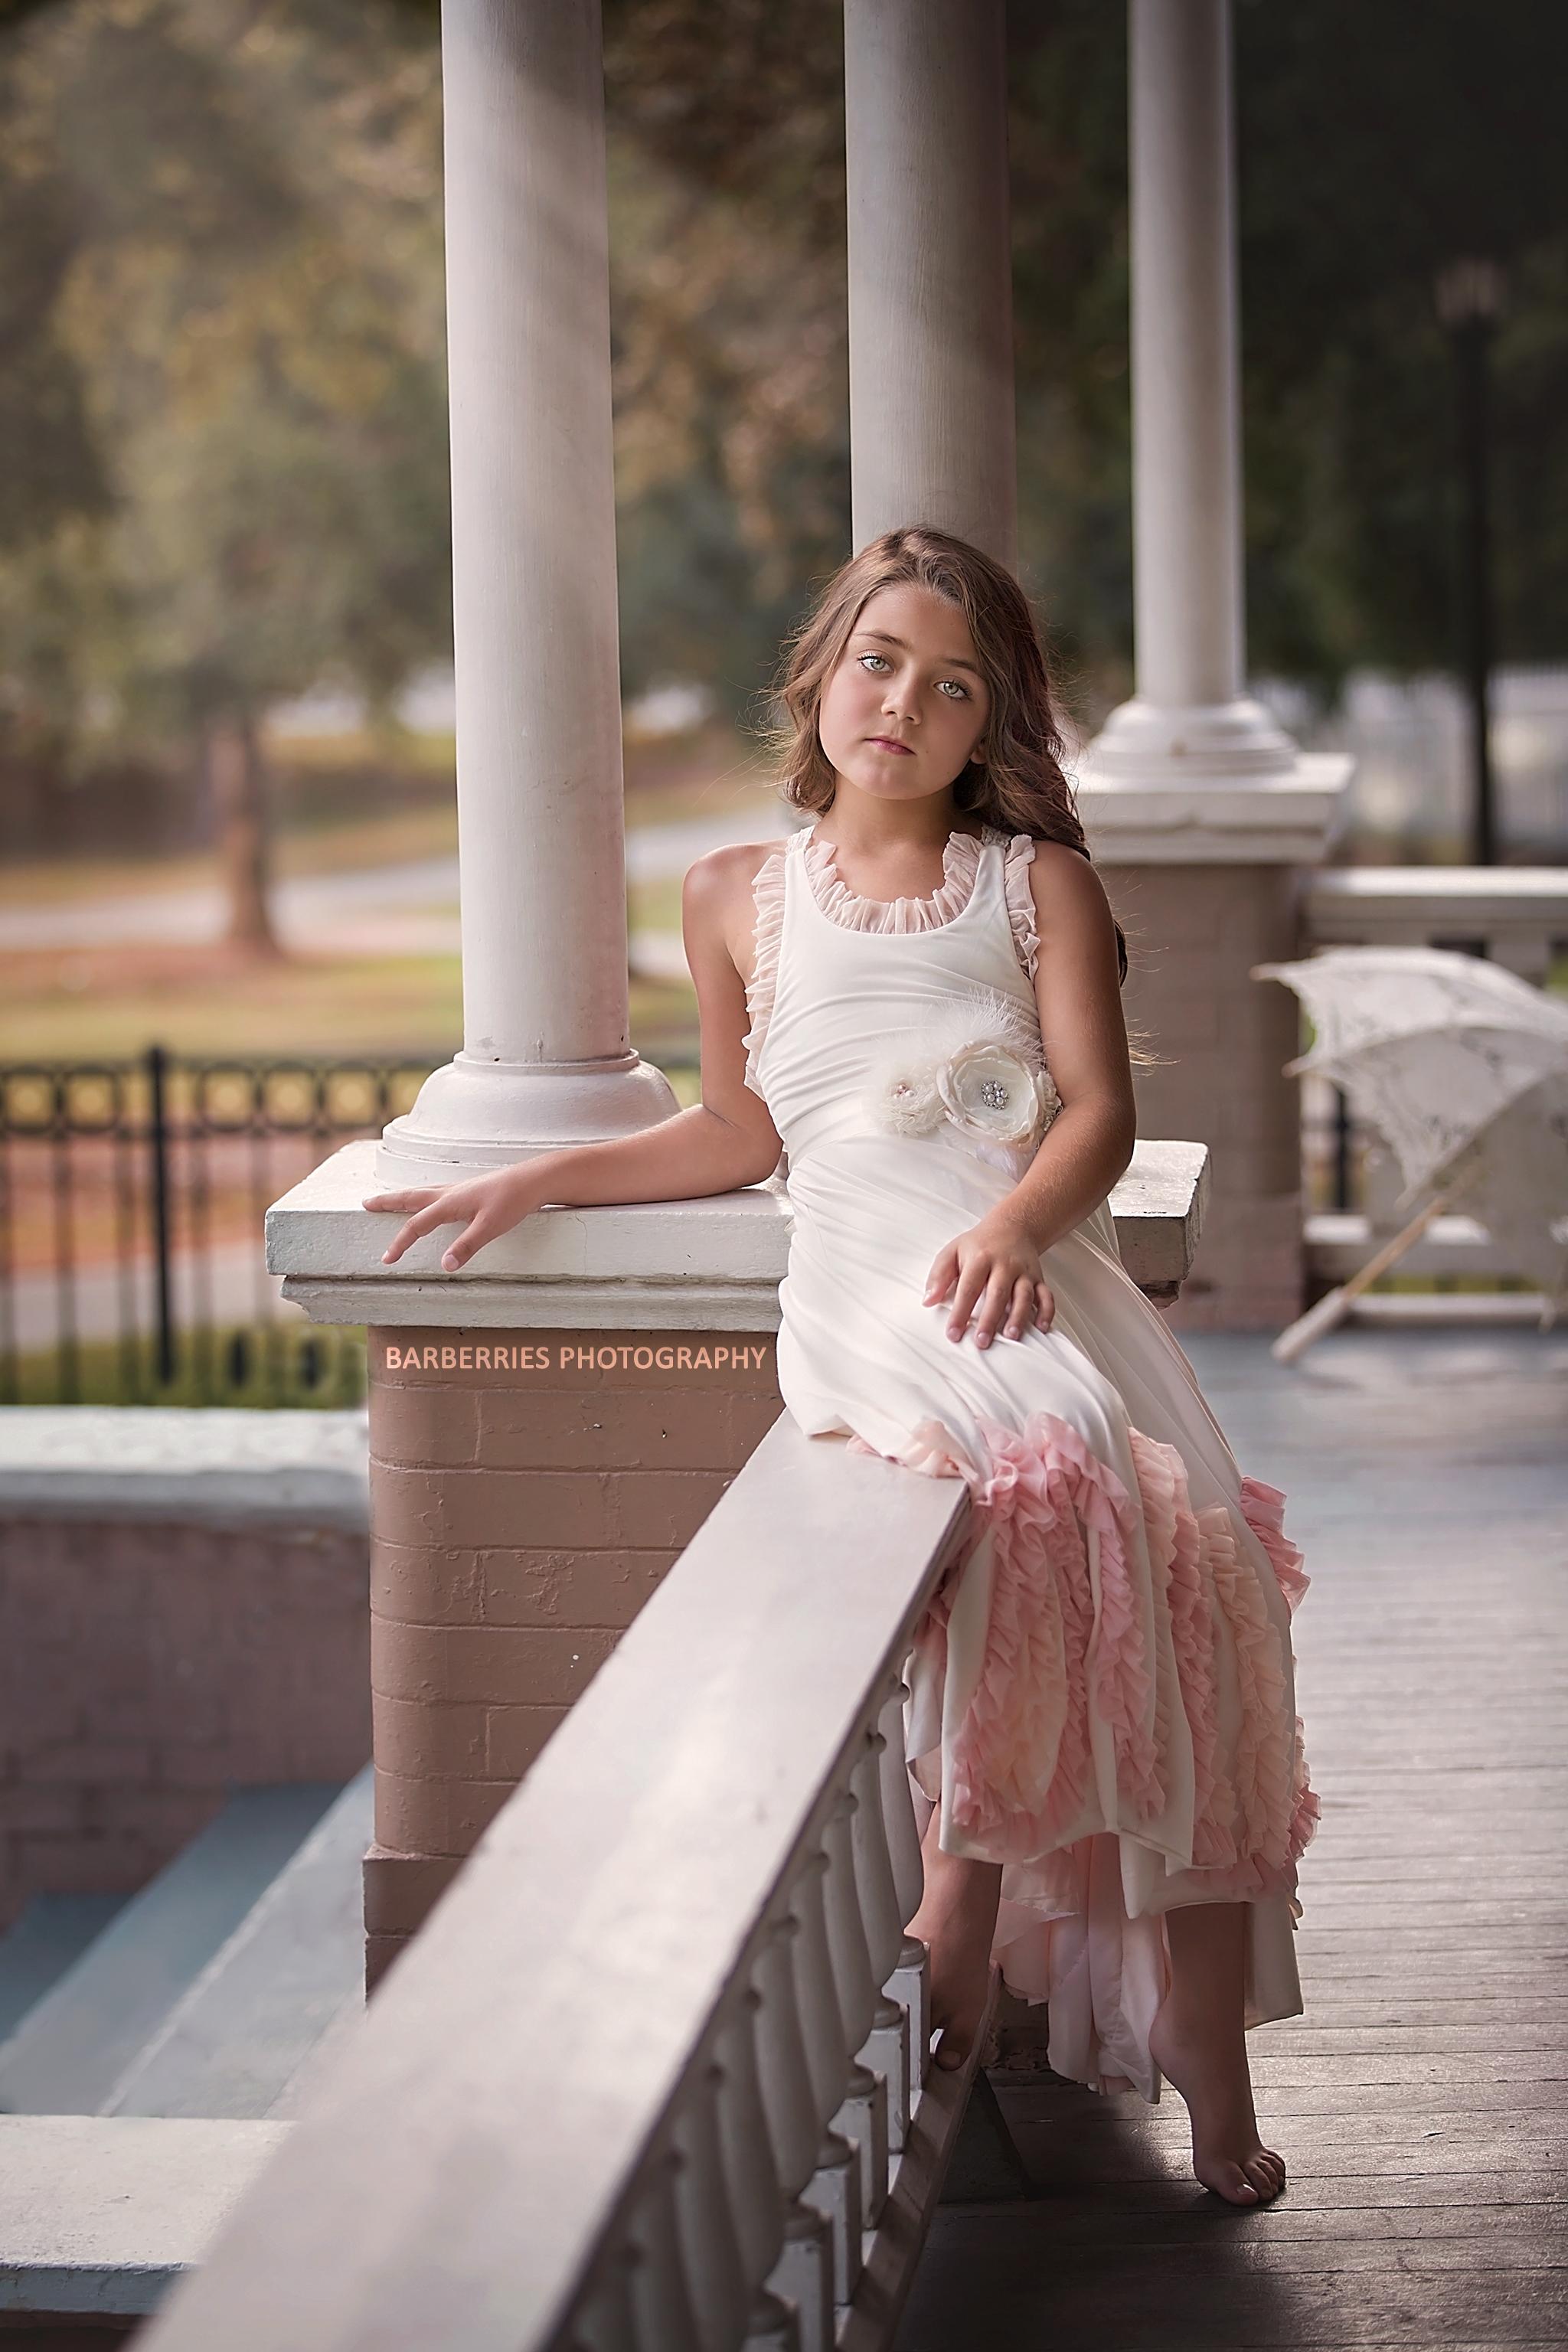 houston-child-fashion-photographer-frilly-frocks.jpg